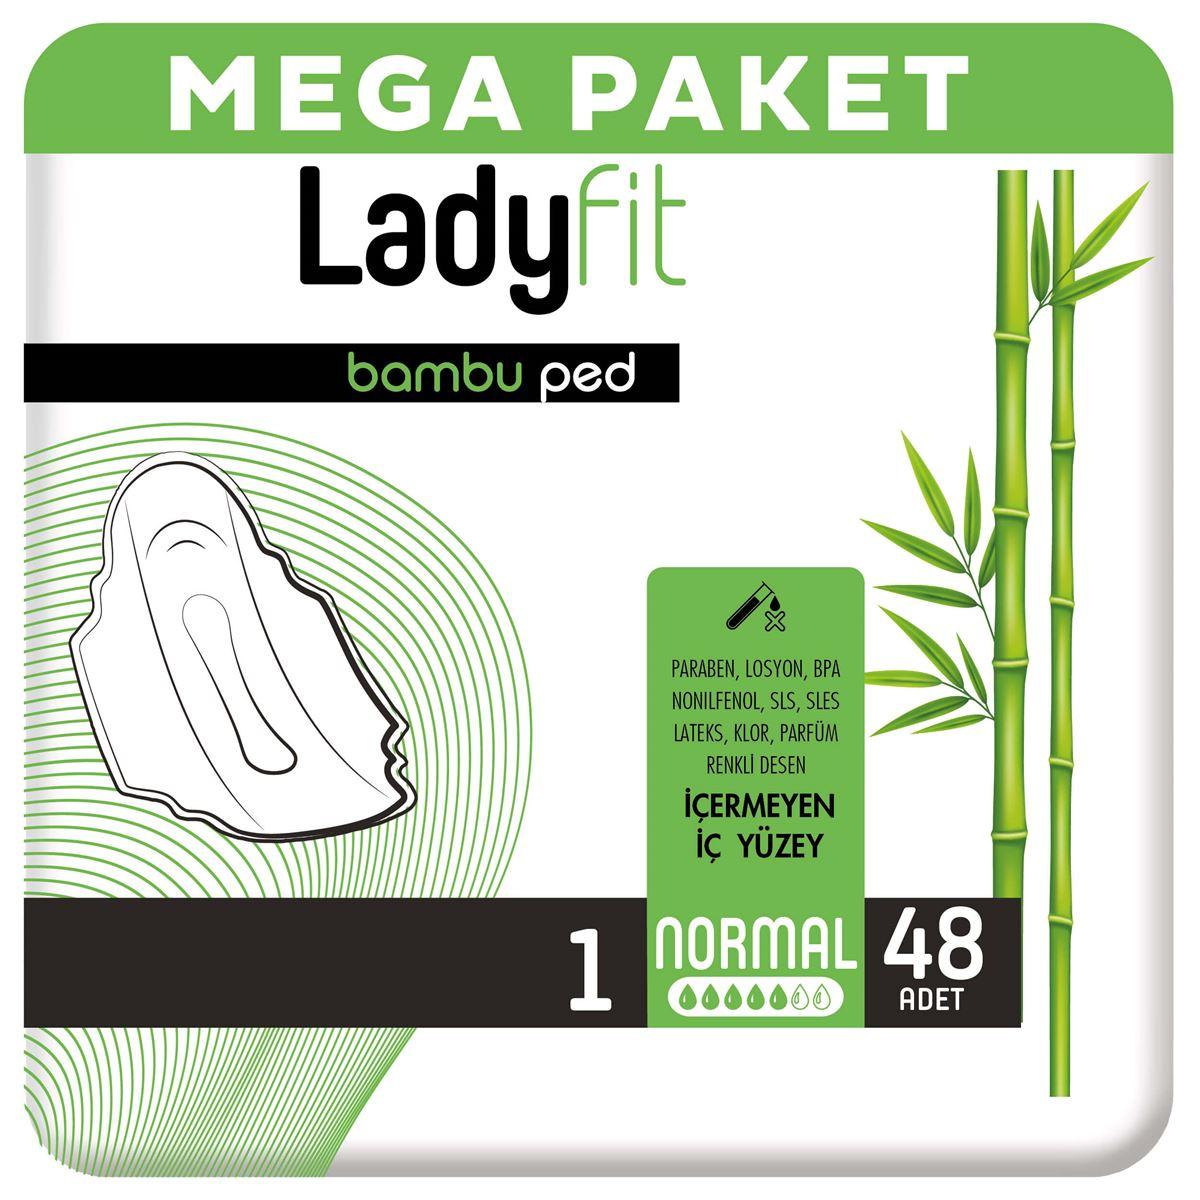 Ladyfit Bambu Ped Mega Normal 48 Ped